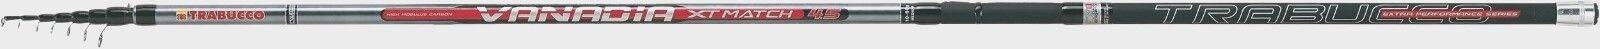 Caña trabucco Telematch Vanadia XT T-Match 4.50mt. 60 Gr.